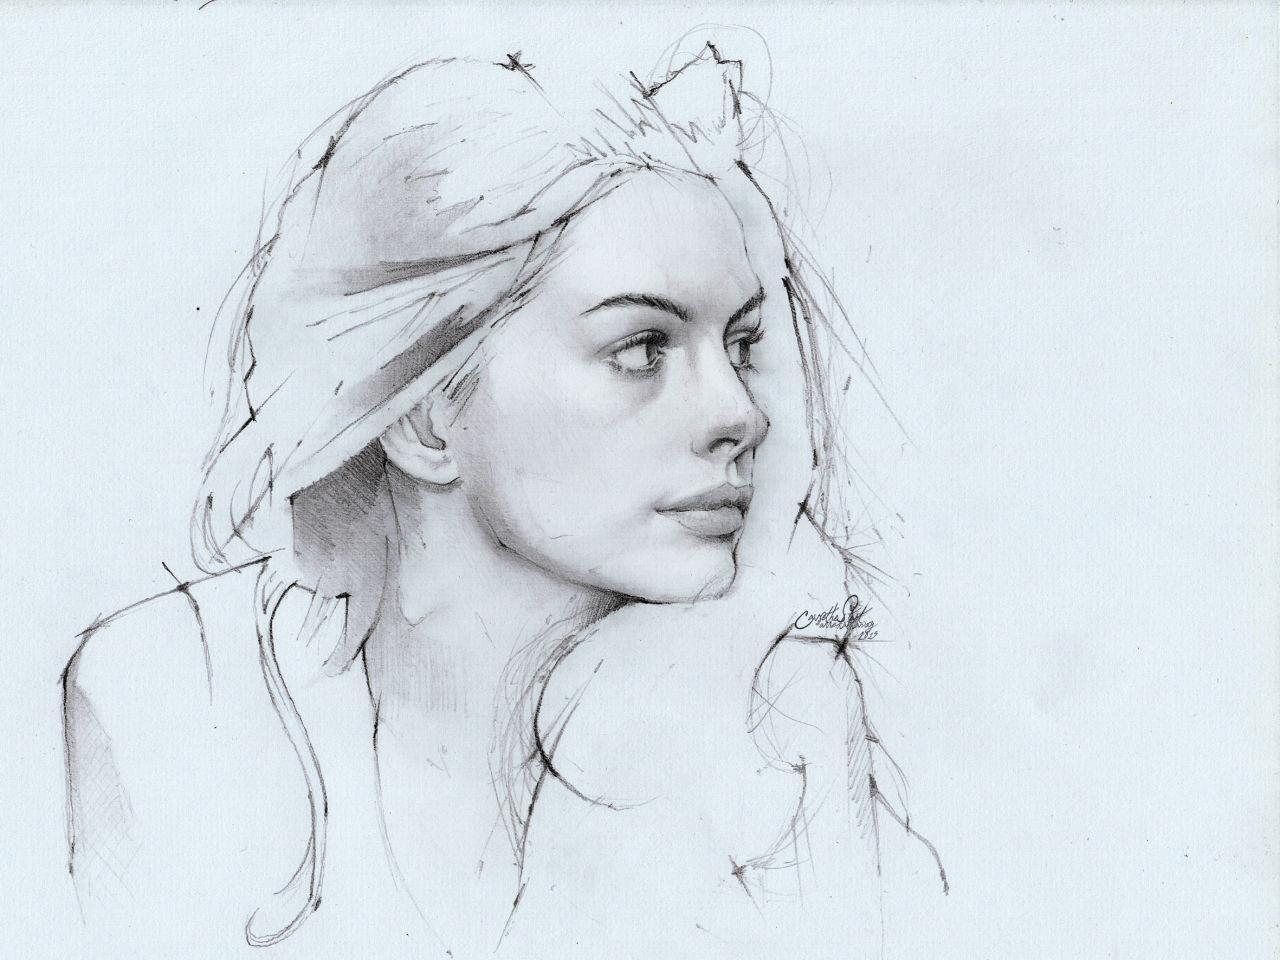 1280x960 Anne Hathaway, Pencil Drawing Photoimage By Aninditowisnu Fliiby